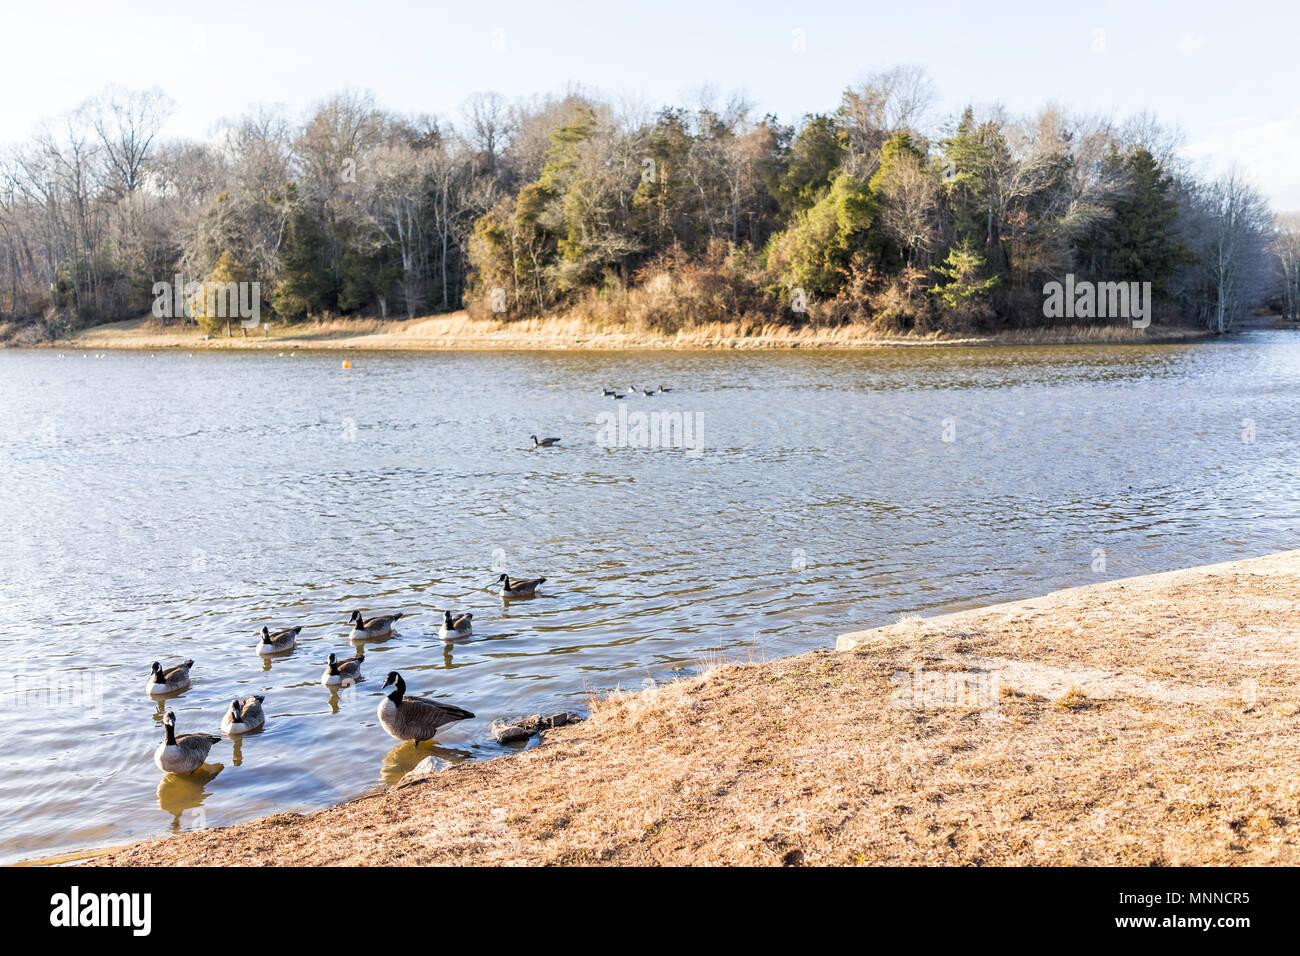 Lake Fairfax Park in winter in Reston, Virginia with flock